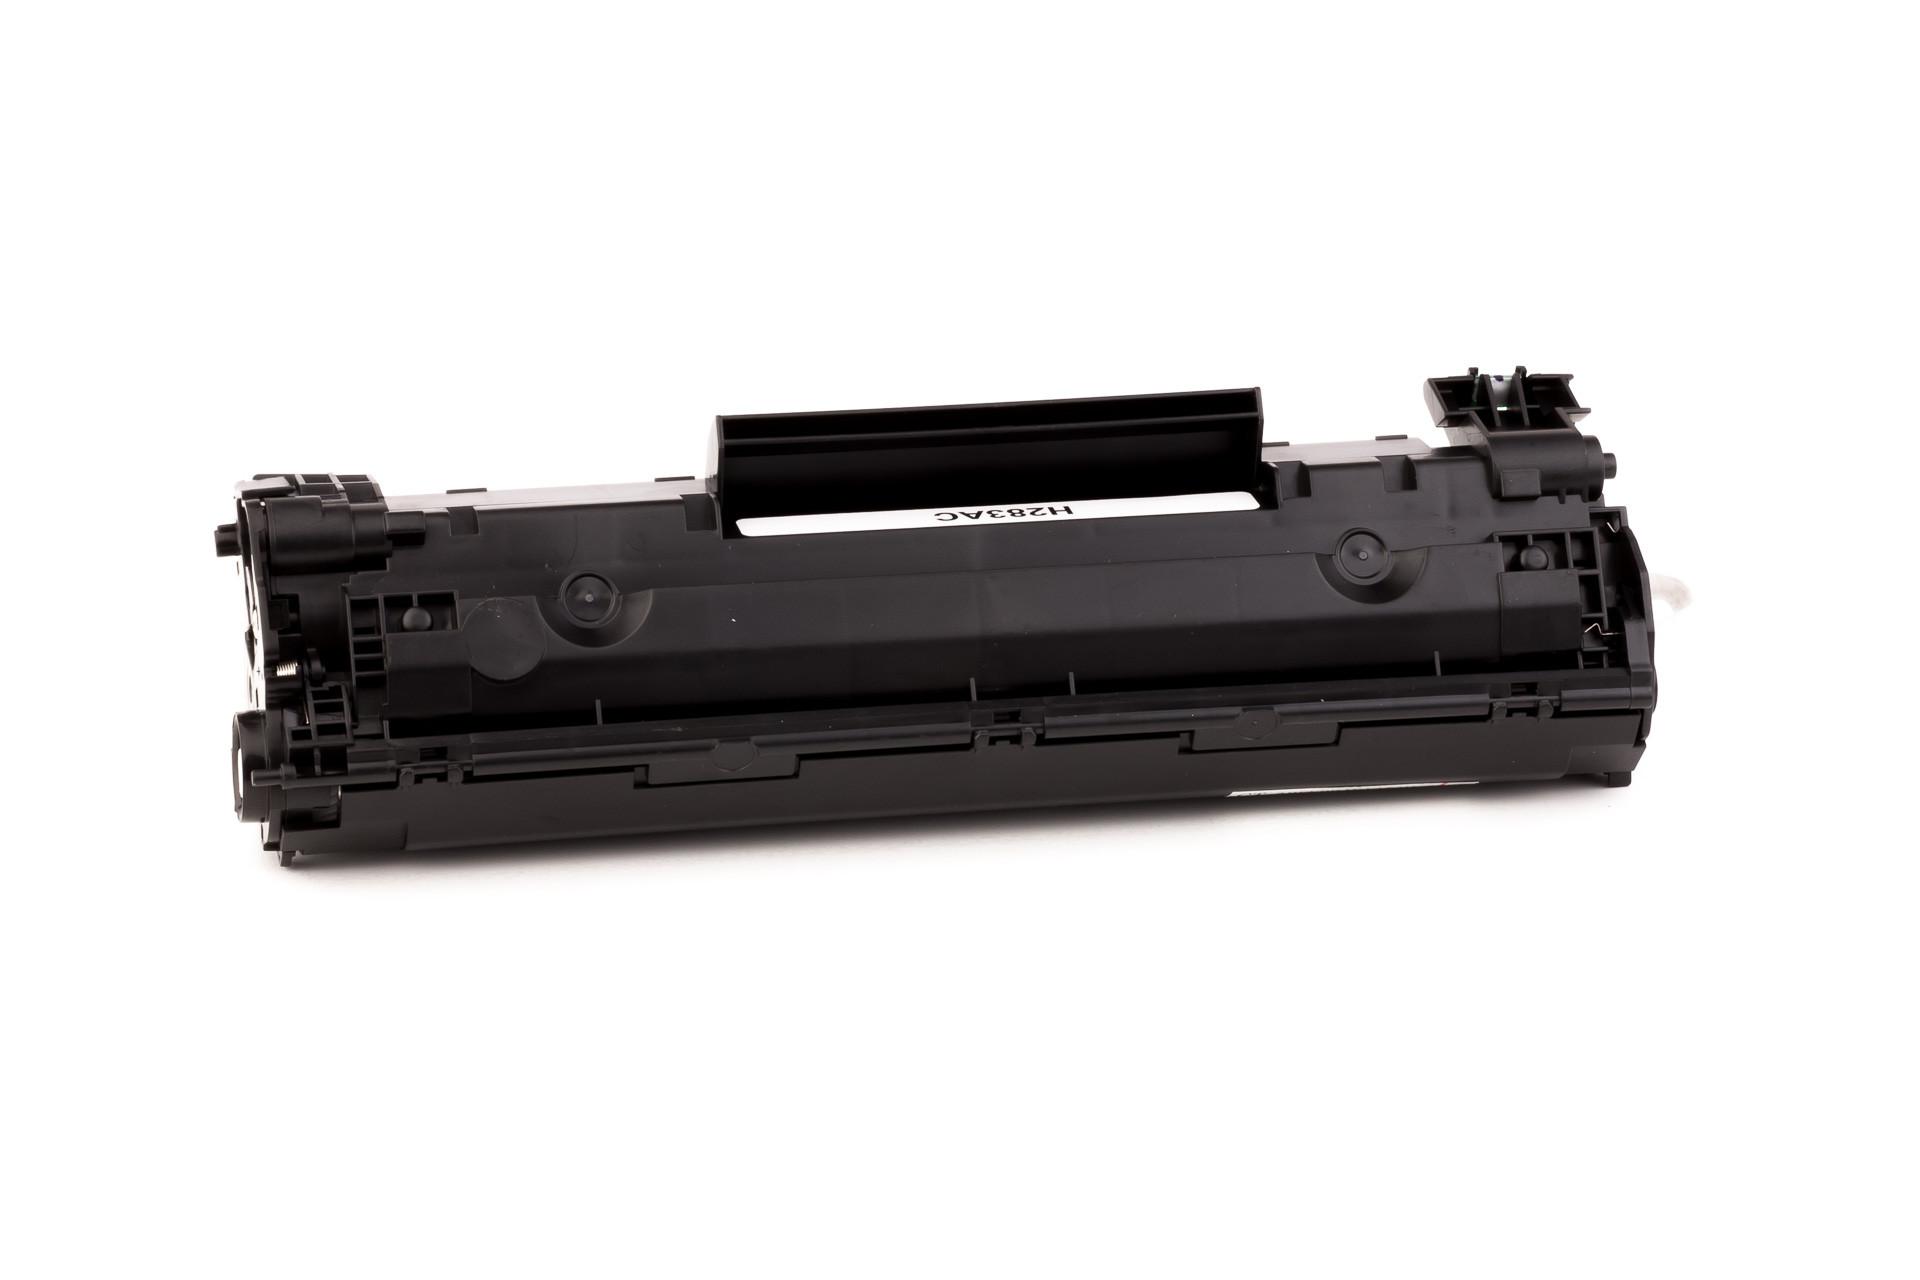 Hp Laserjet Pro Mfp M 125 Nw Tonerkartusche Alternativ Toner Compatible 83a Cf283a Cartridge M125 M127fn Alternative With Cf 283 A